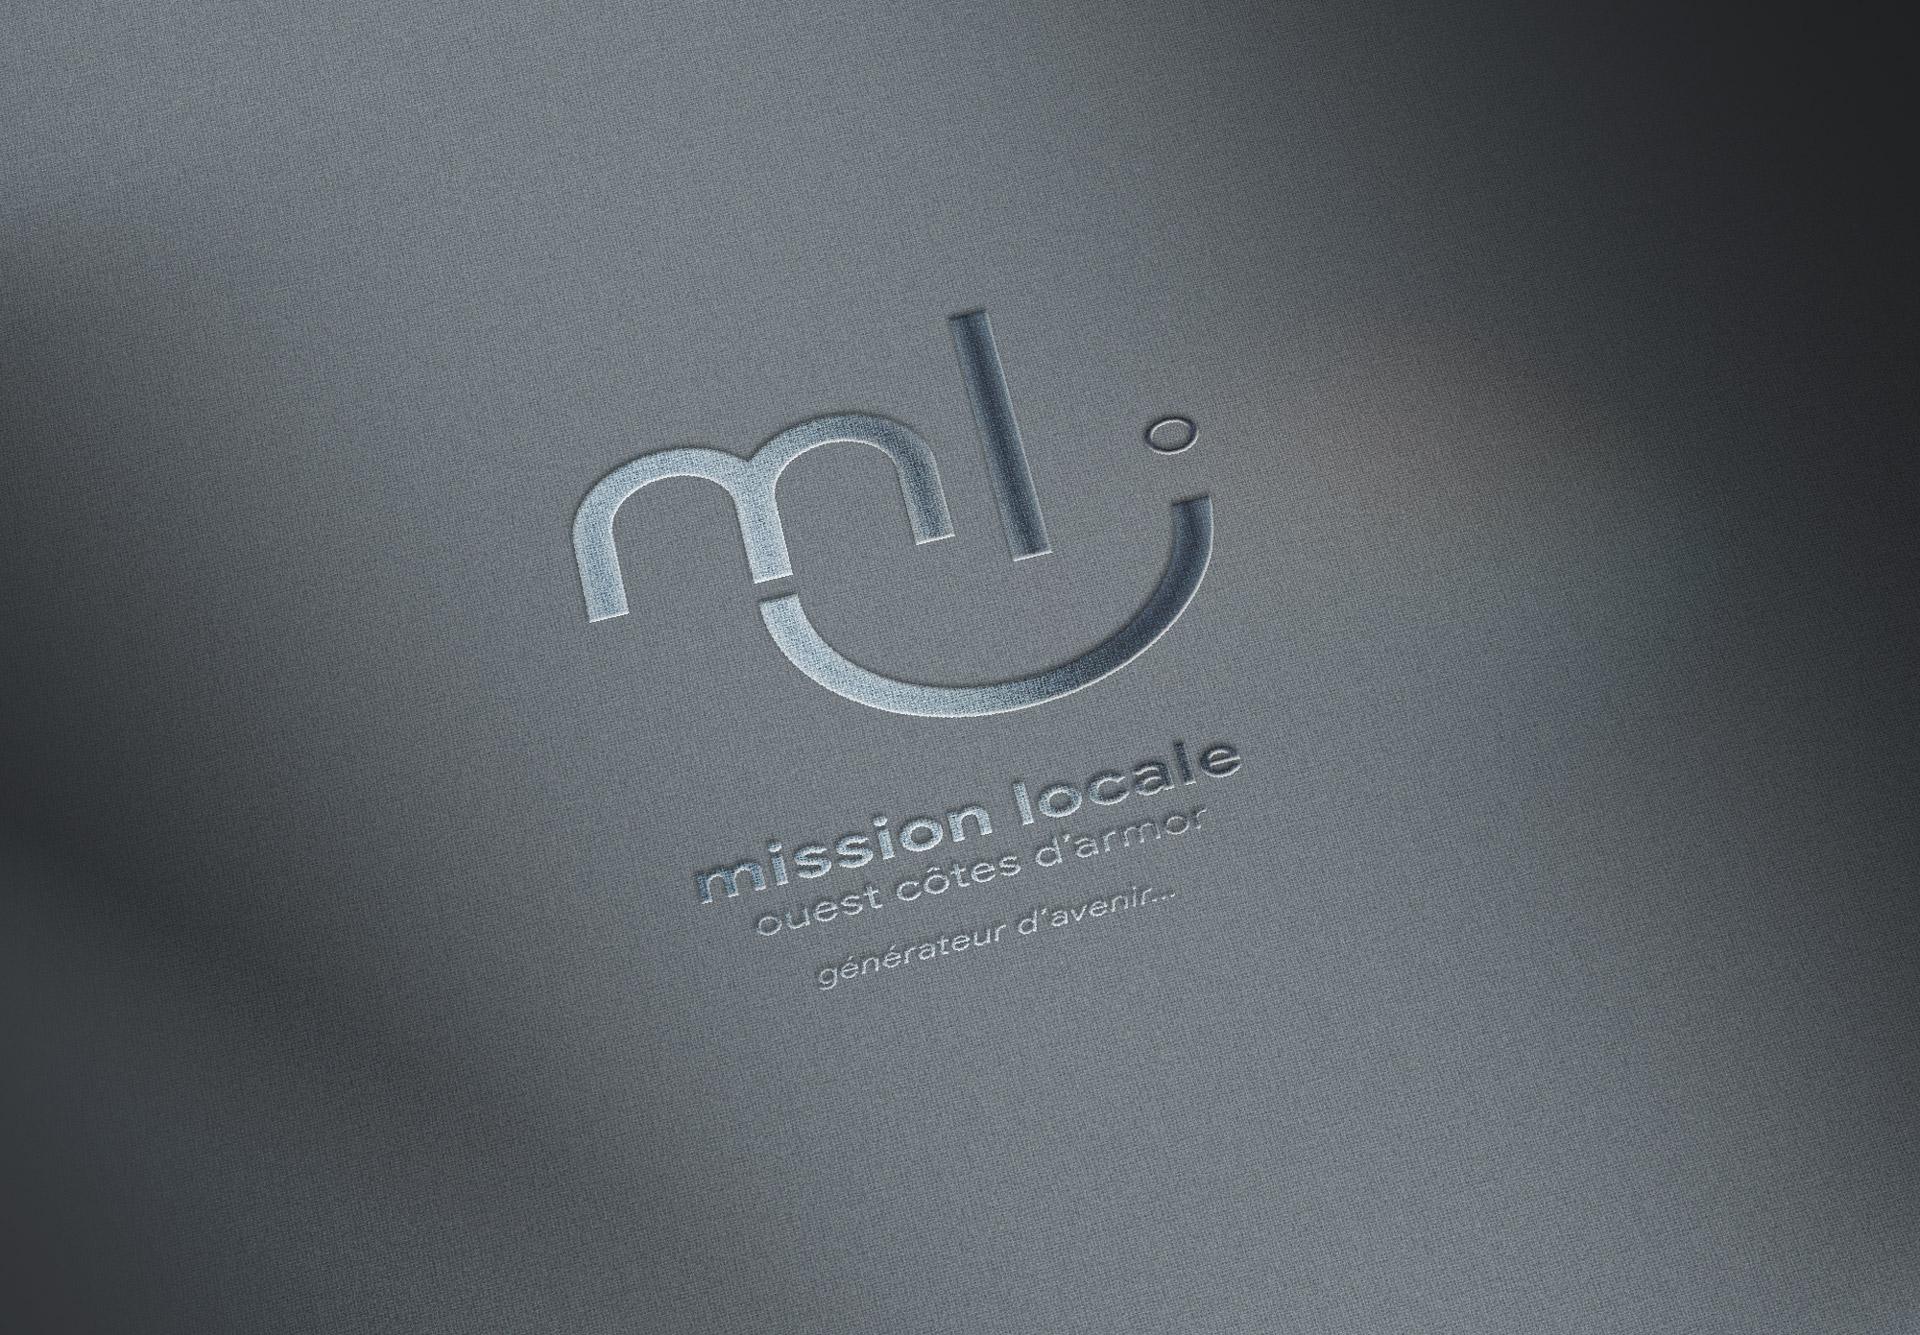 finition-vernis-selectif-brillant_mission-locale-agence-coquliko